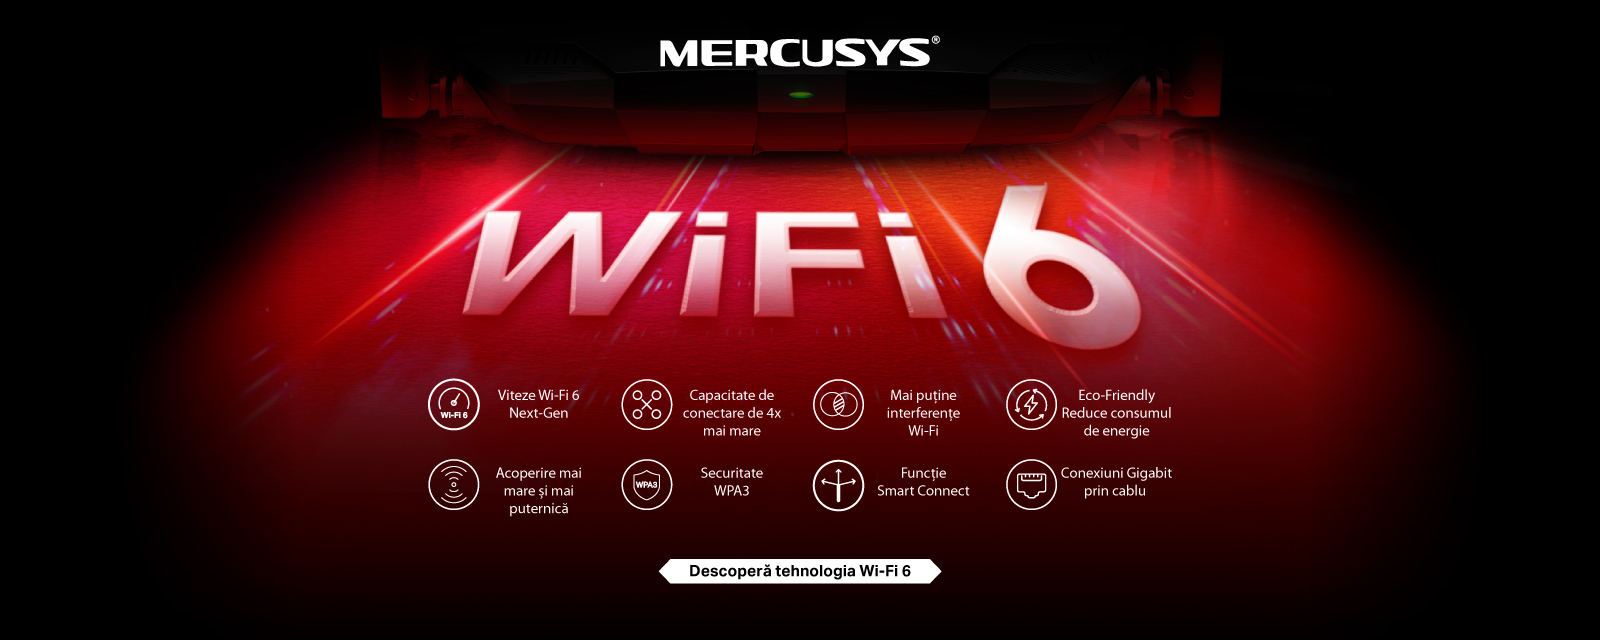 Wi-Fi 6 Mercusys